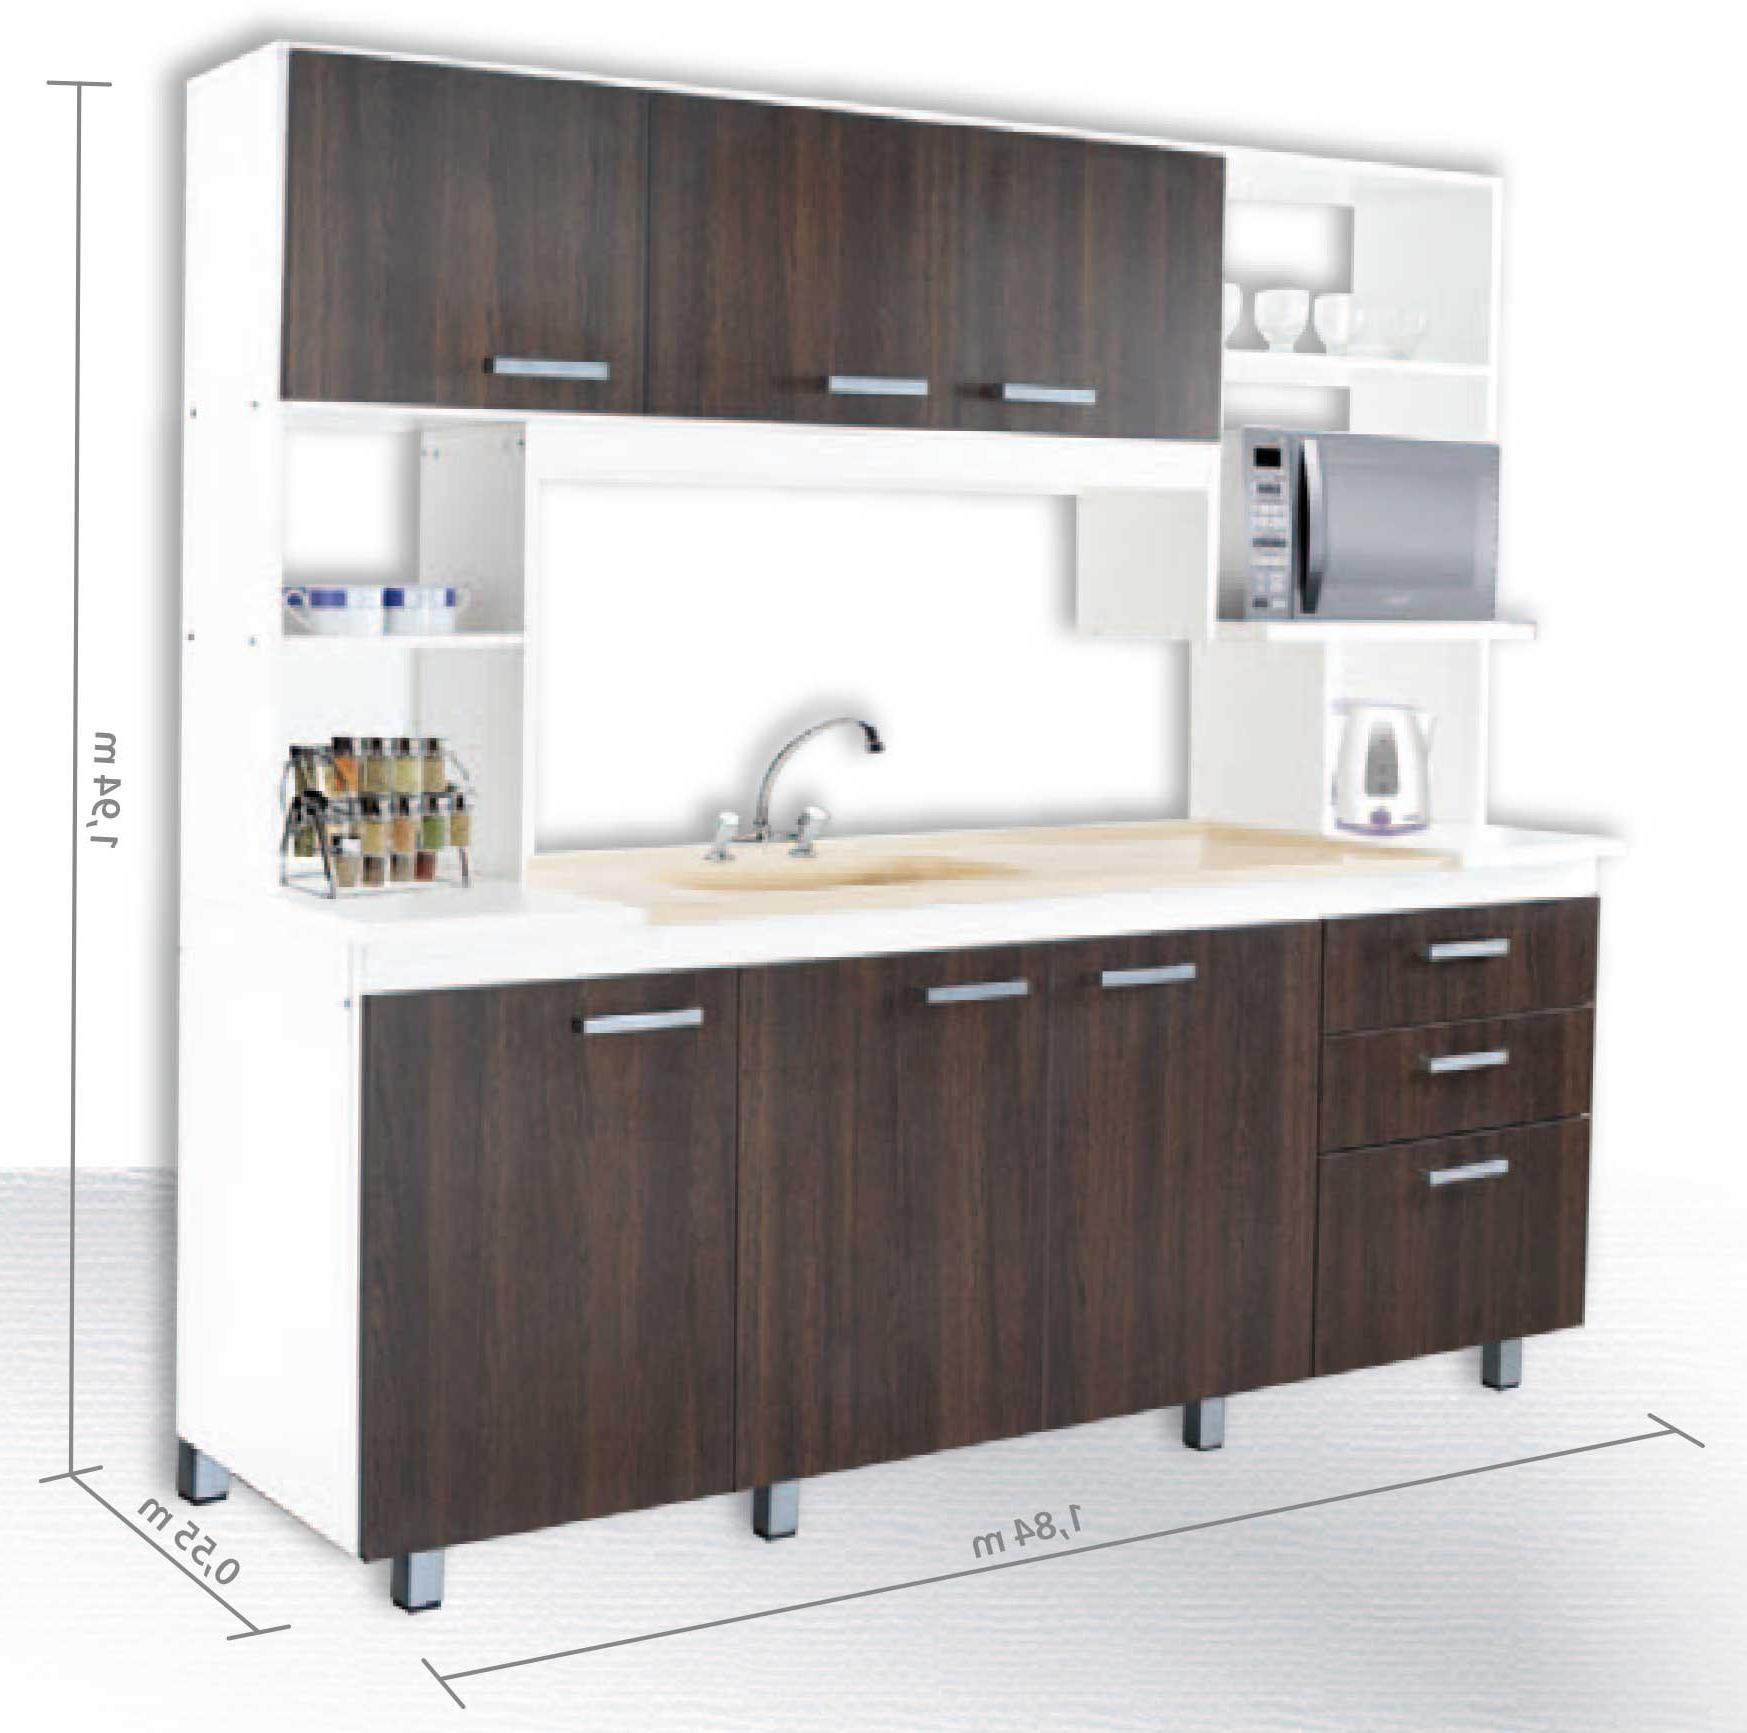 Muebles Cocina En Kit Tldn Elegante Muebles Para Cocina Kit De Platinum 365